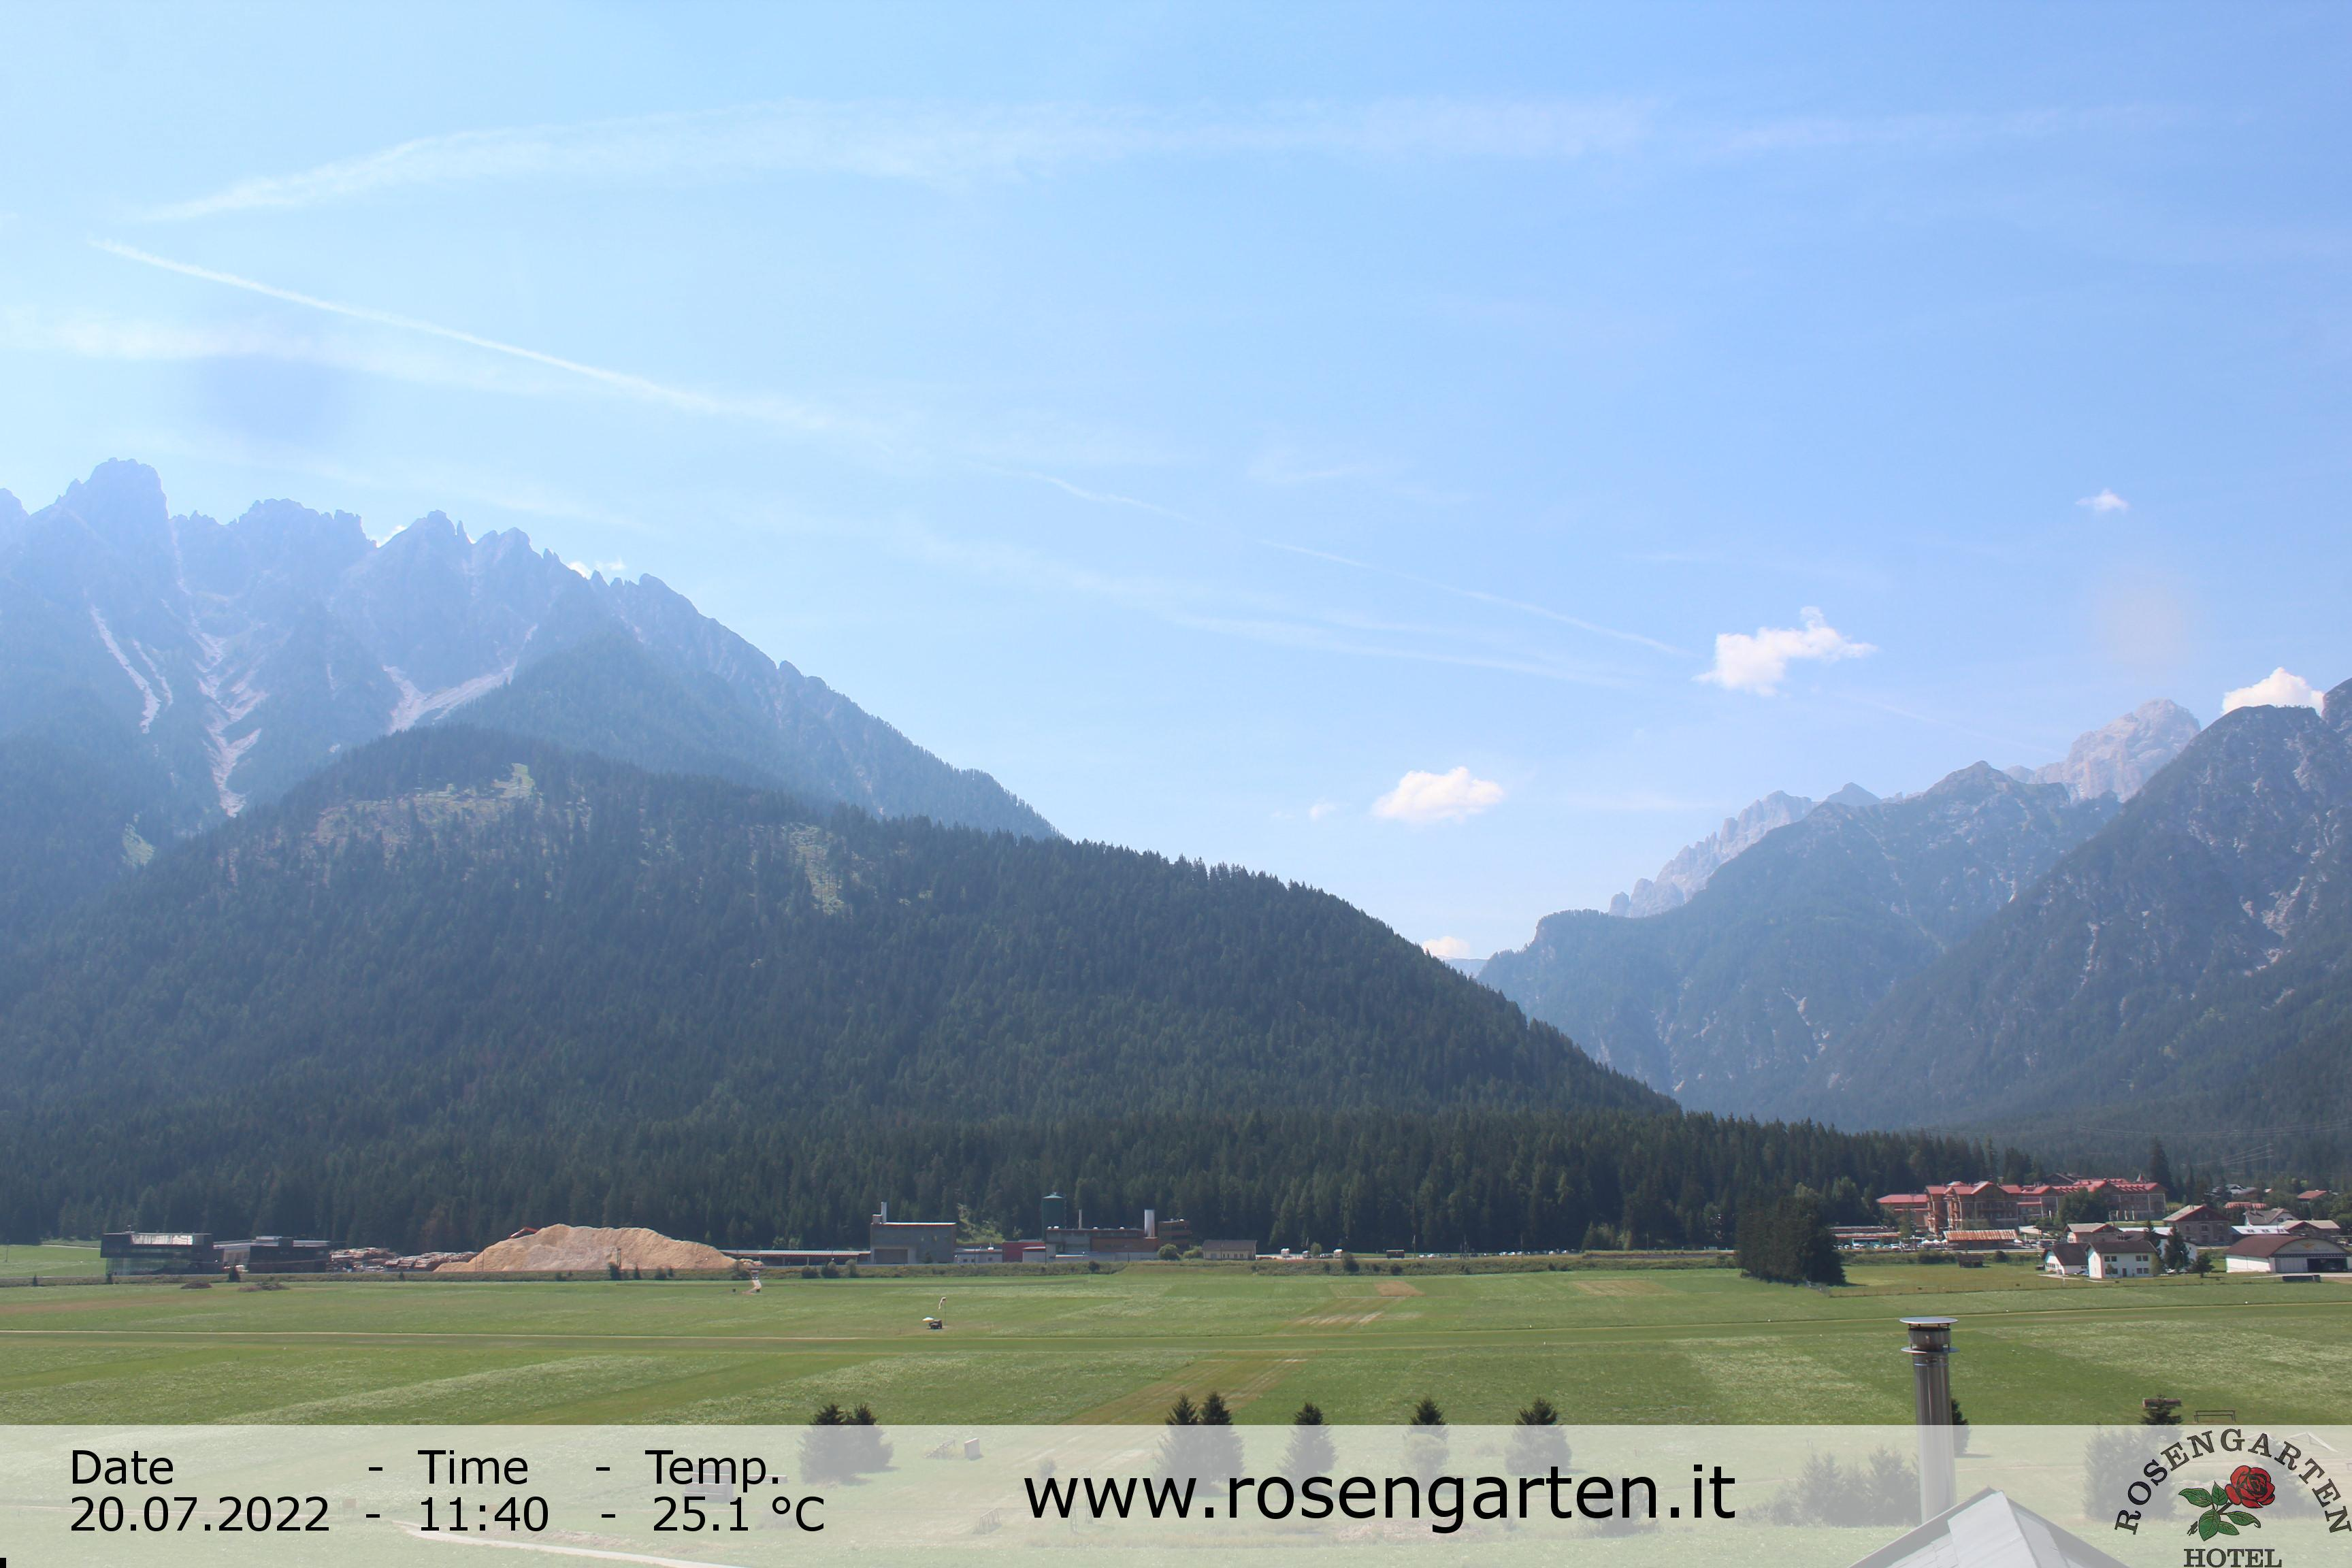 24h Timelapse Toblach (Dolomites), Italy